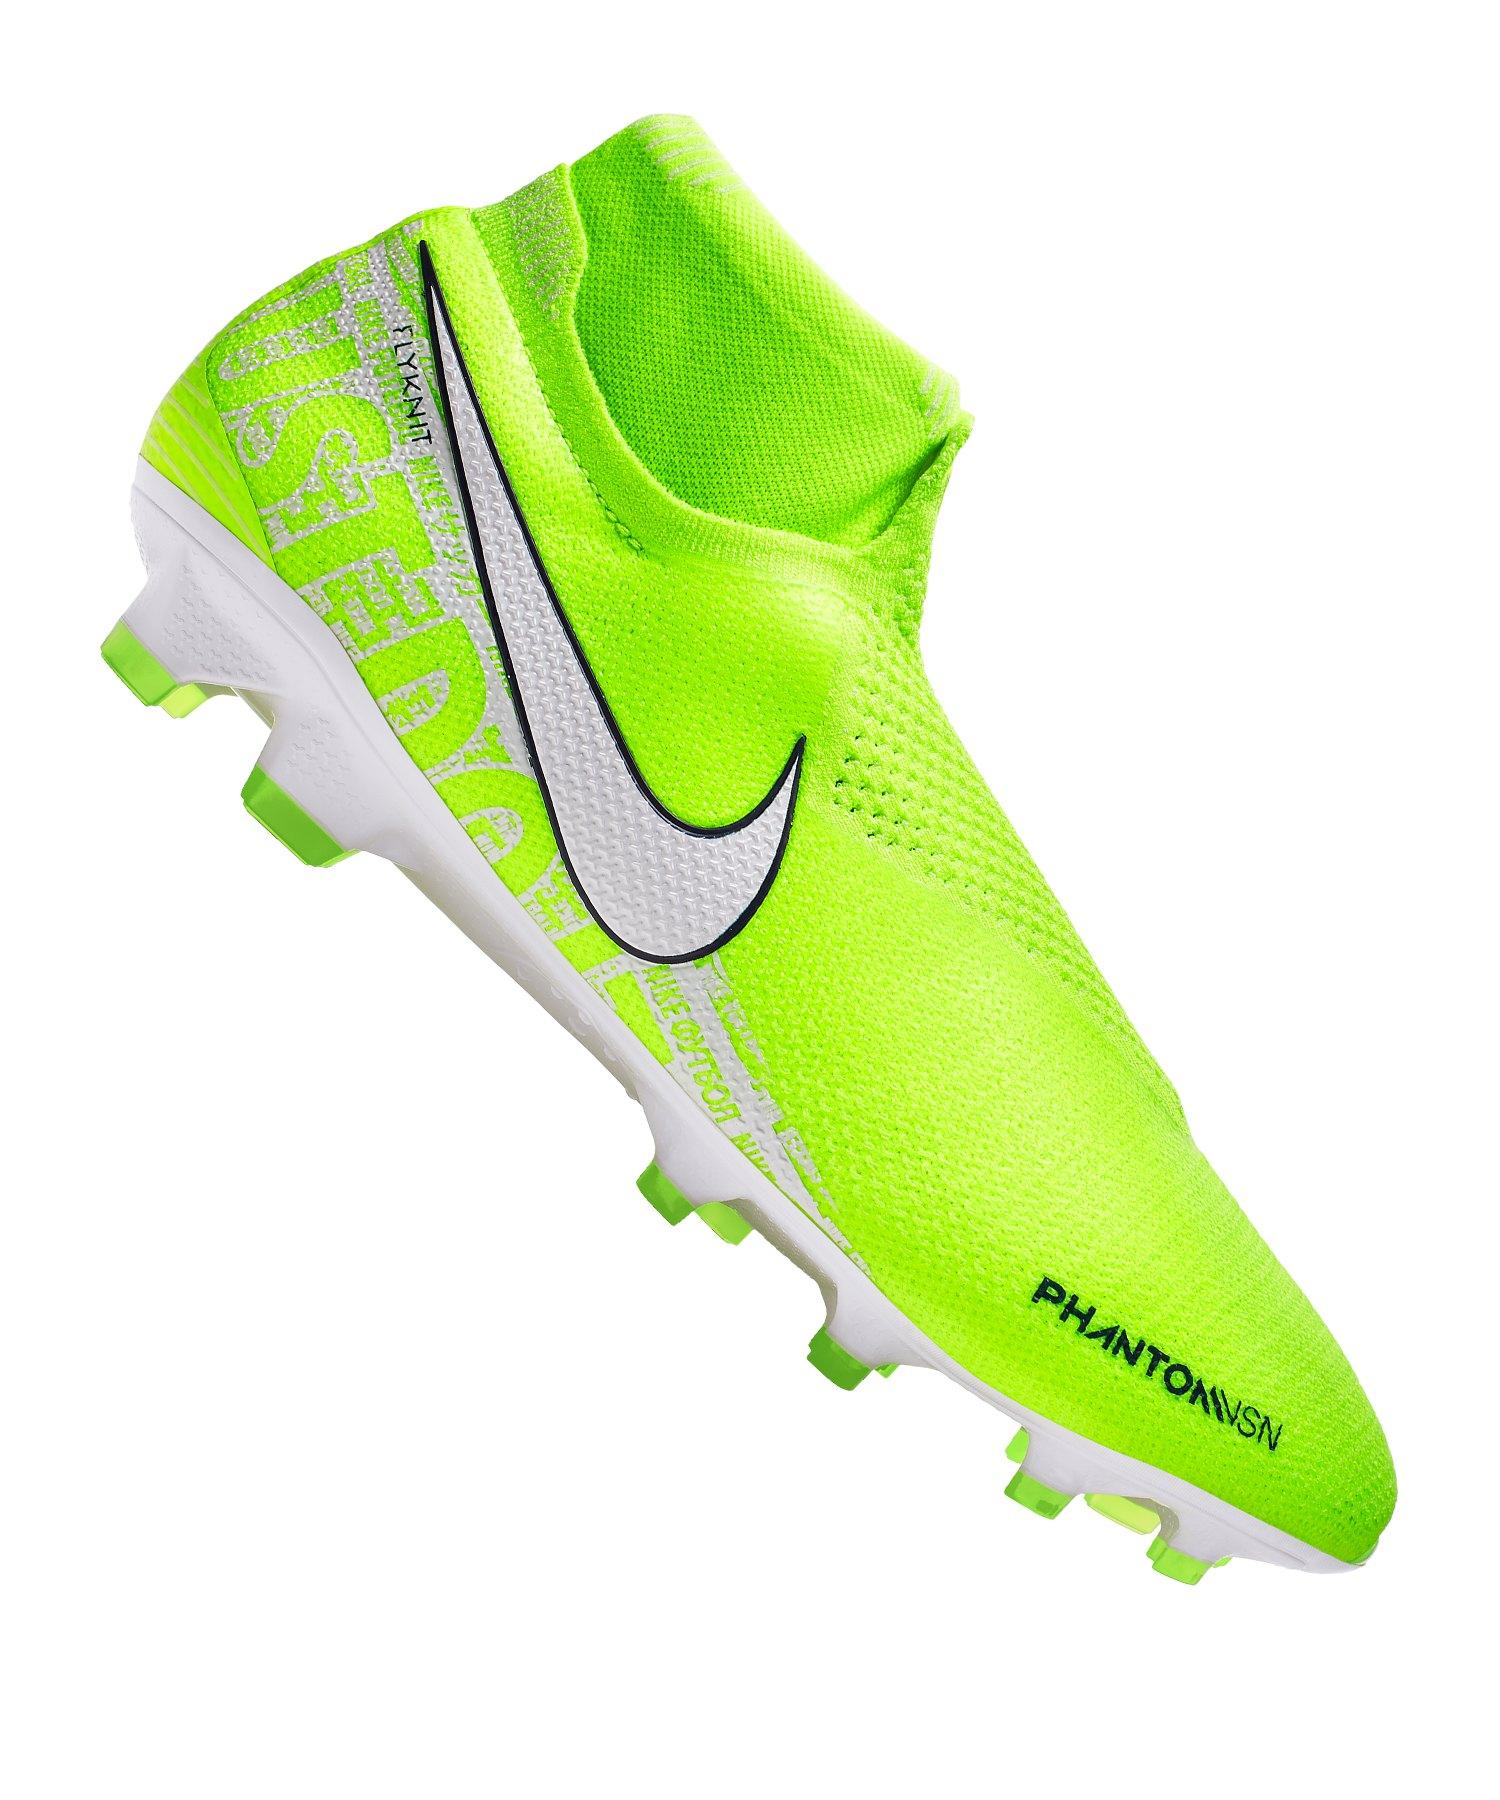 Nike Phantom Vision Elite FG Gelb Weiss F717 - gelb